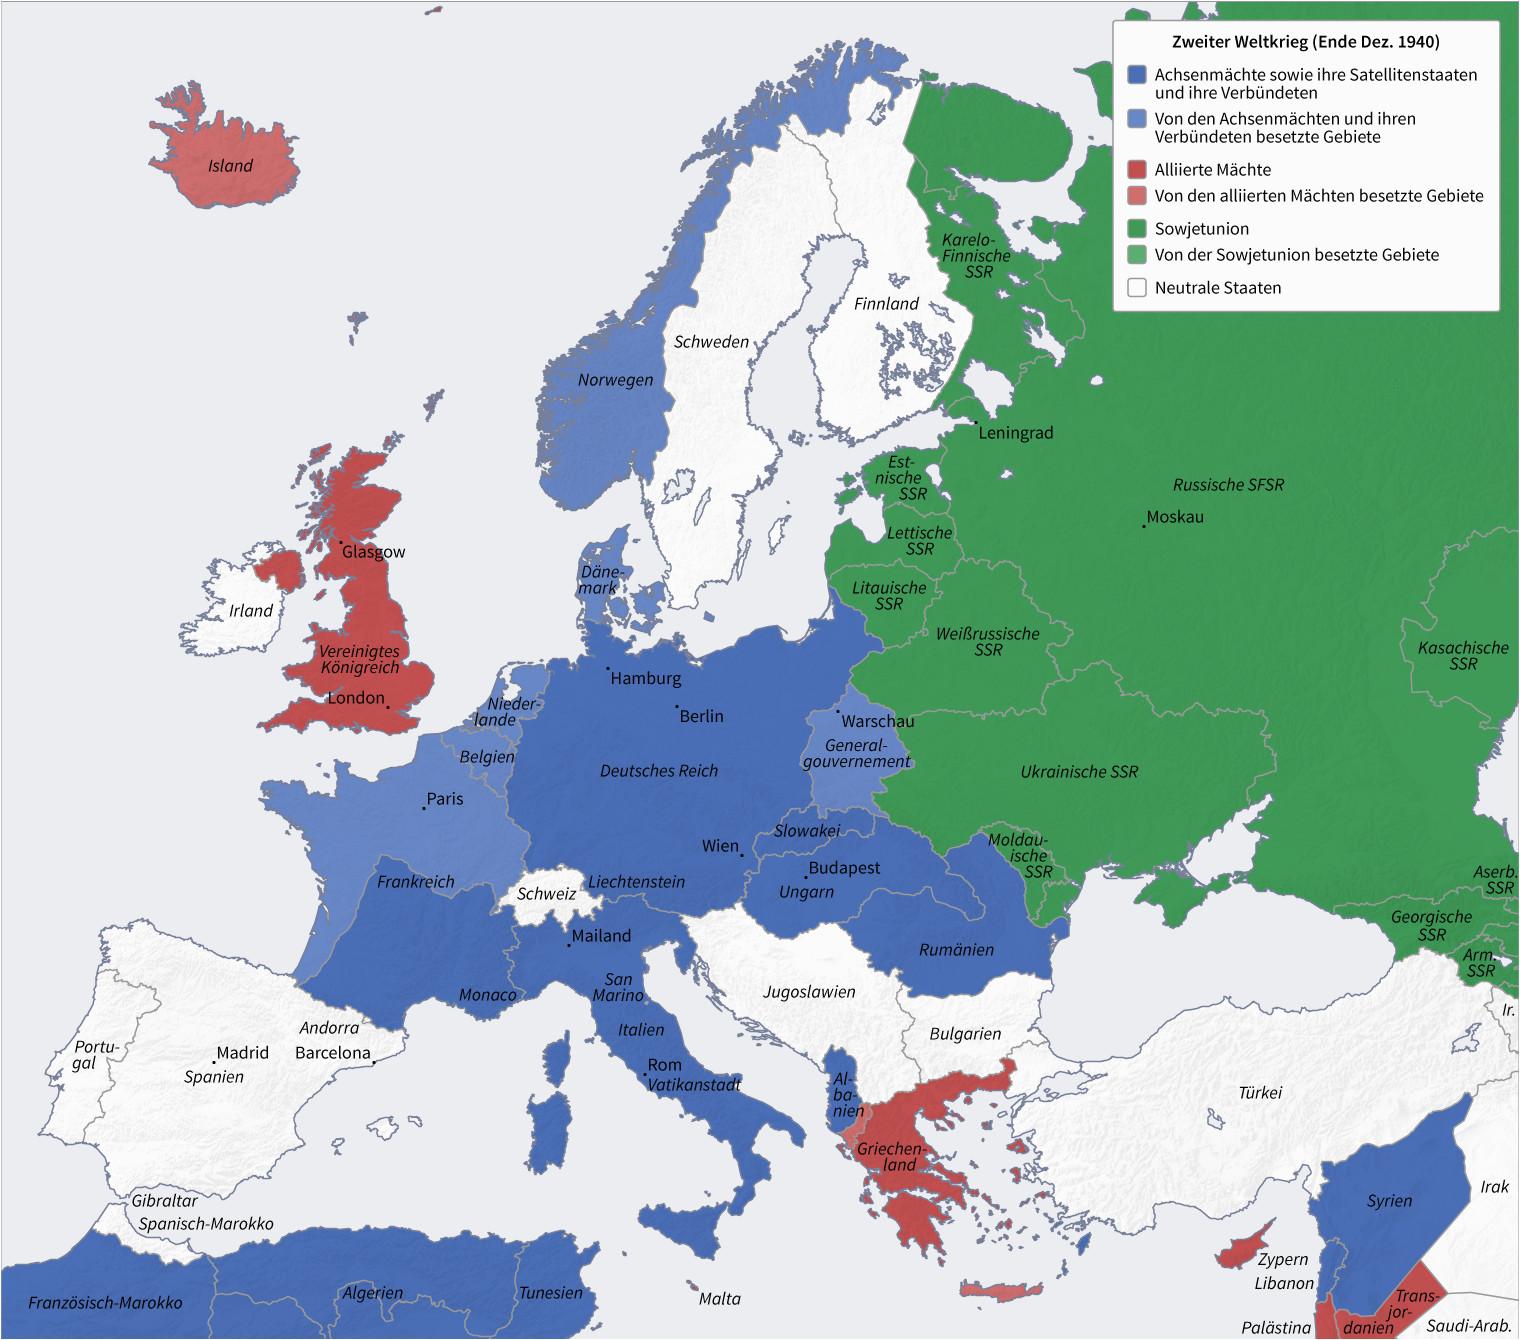 Map Of Europe In 1940 Datei Second World War Europe 12 1940 De Png Wikipedia